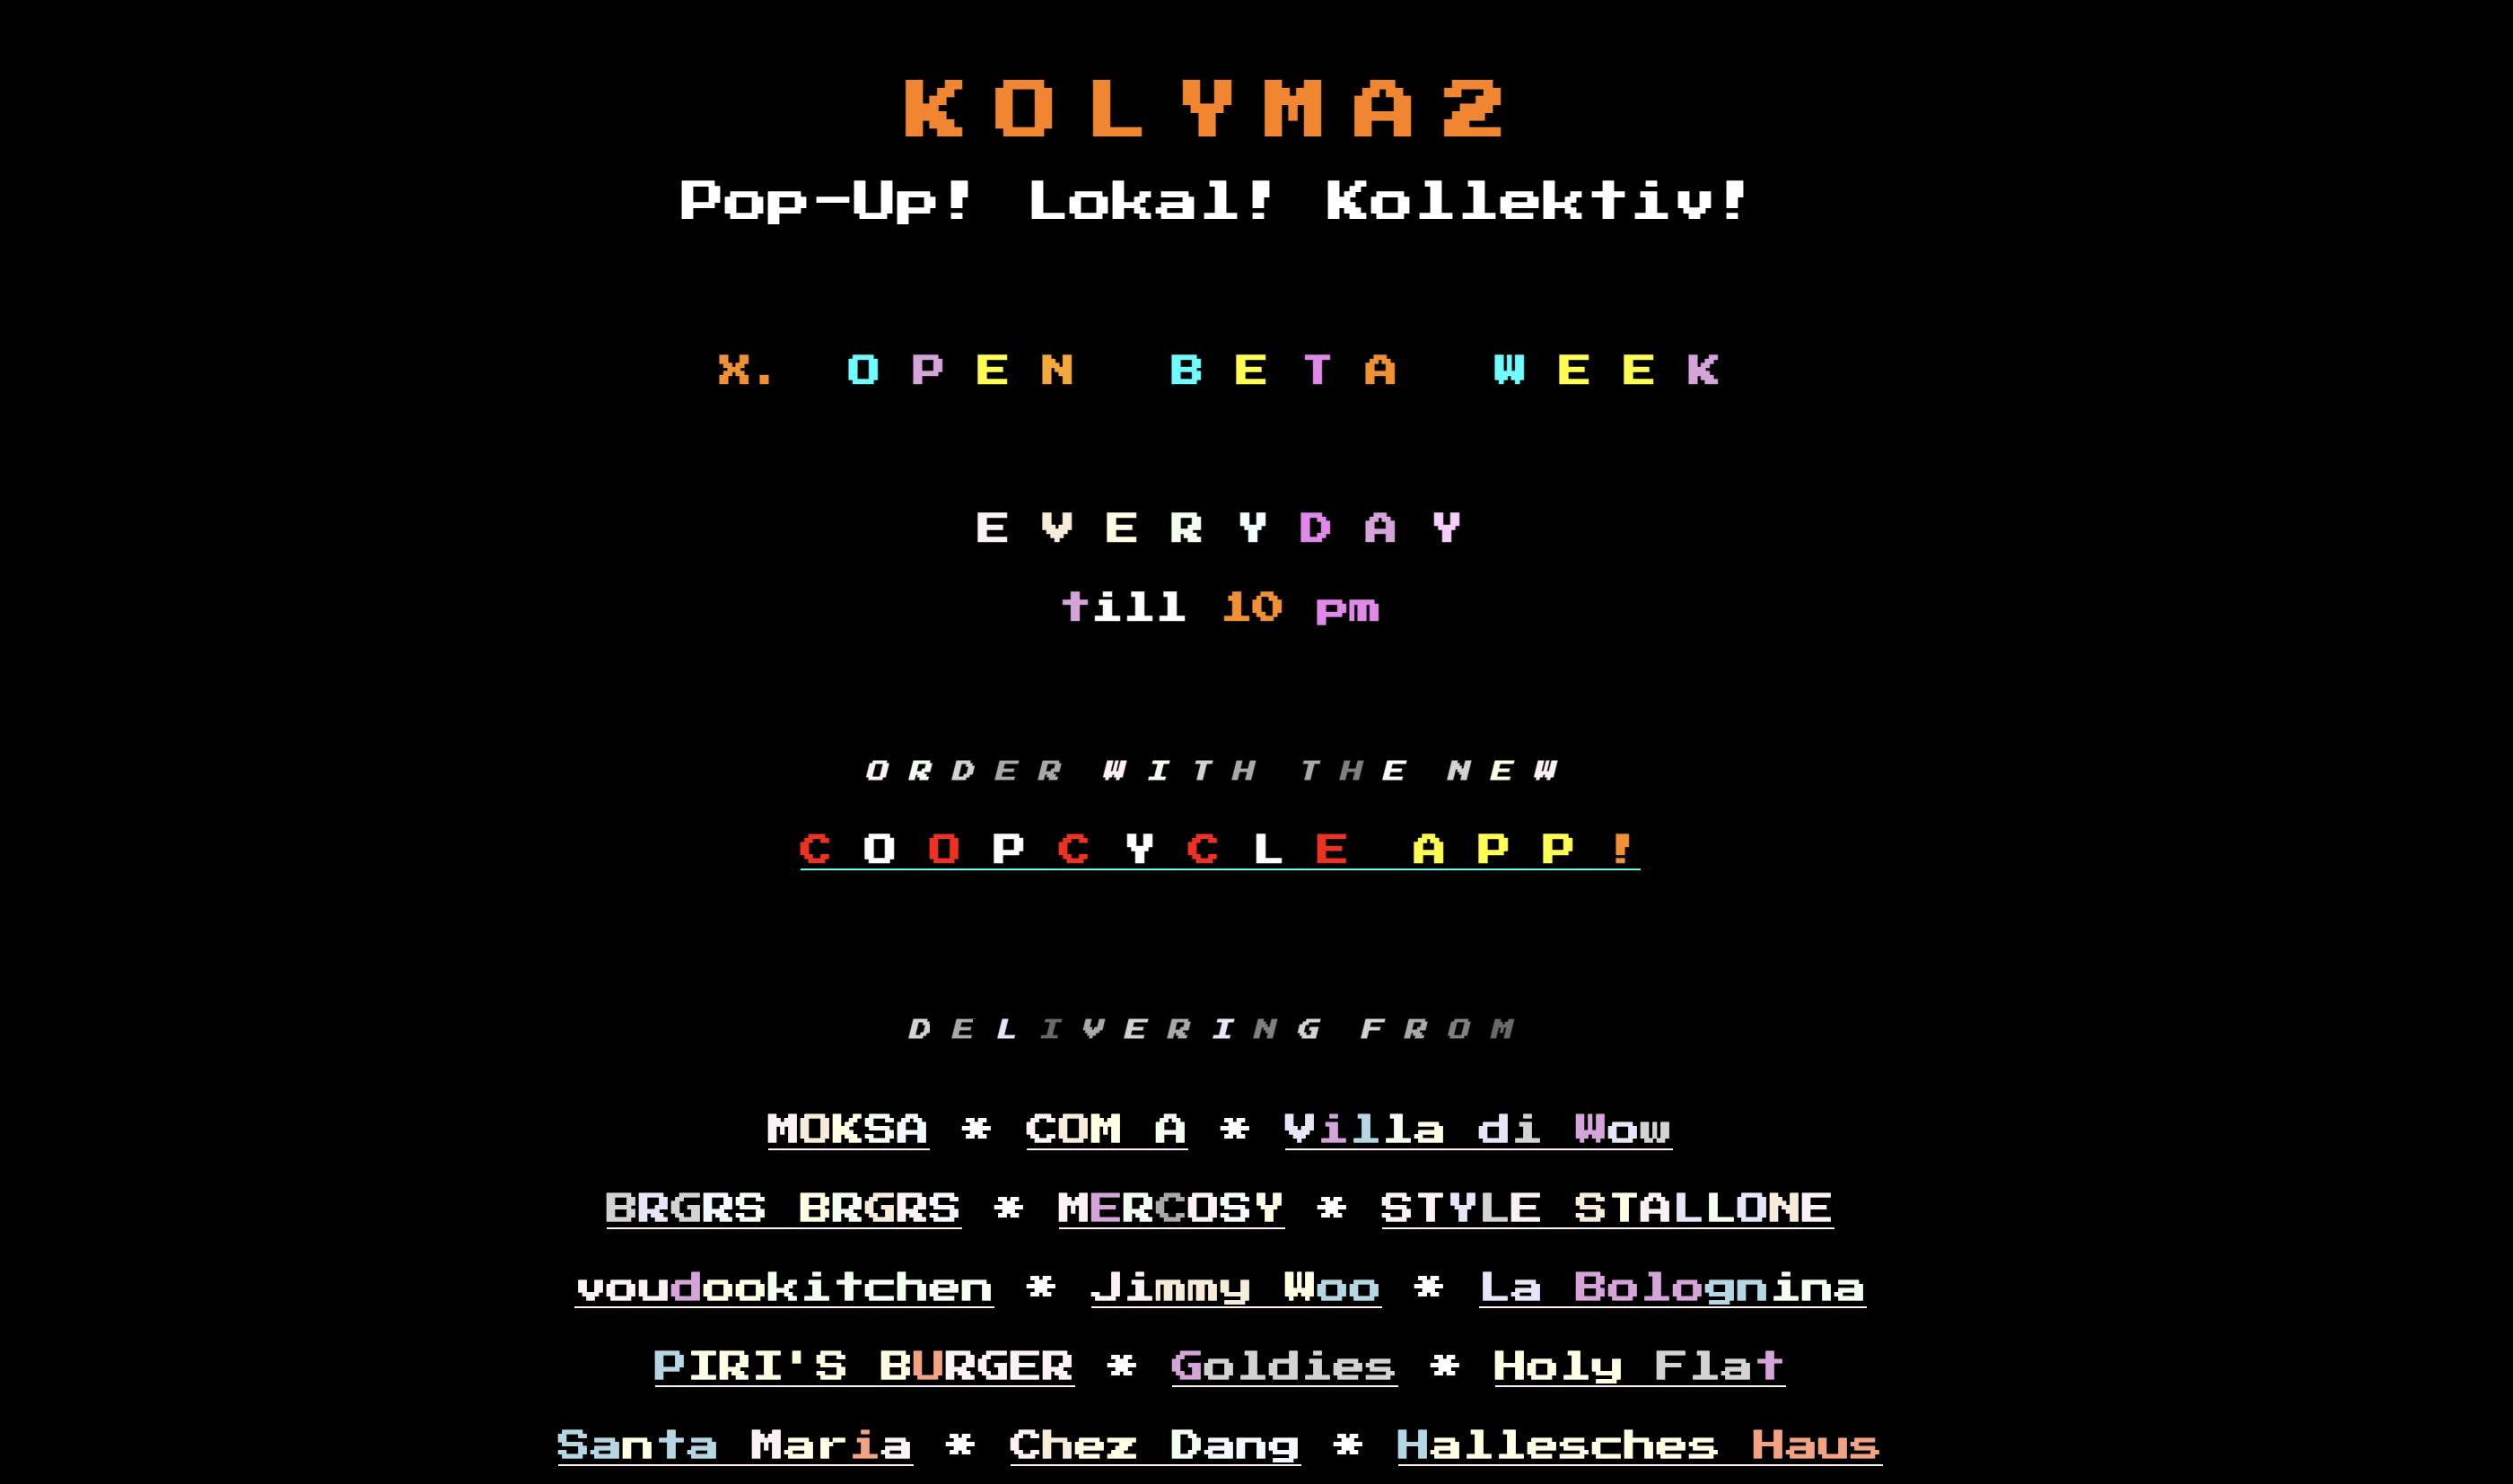 Kolyma2 is a Berlin Cooperative